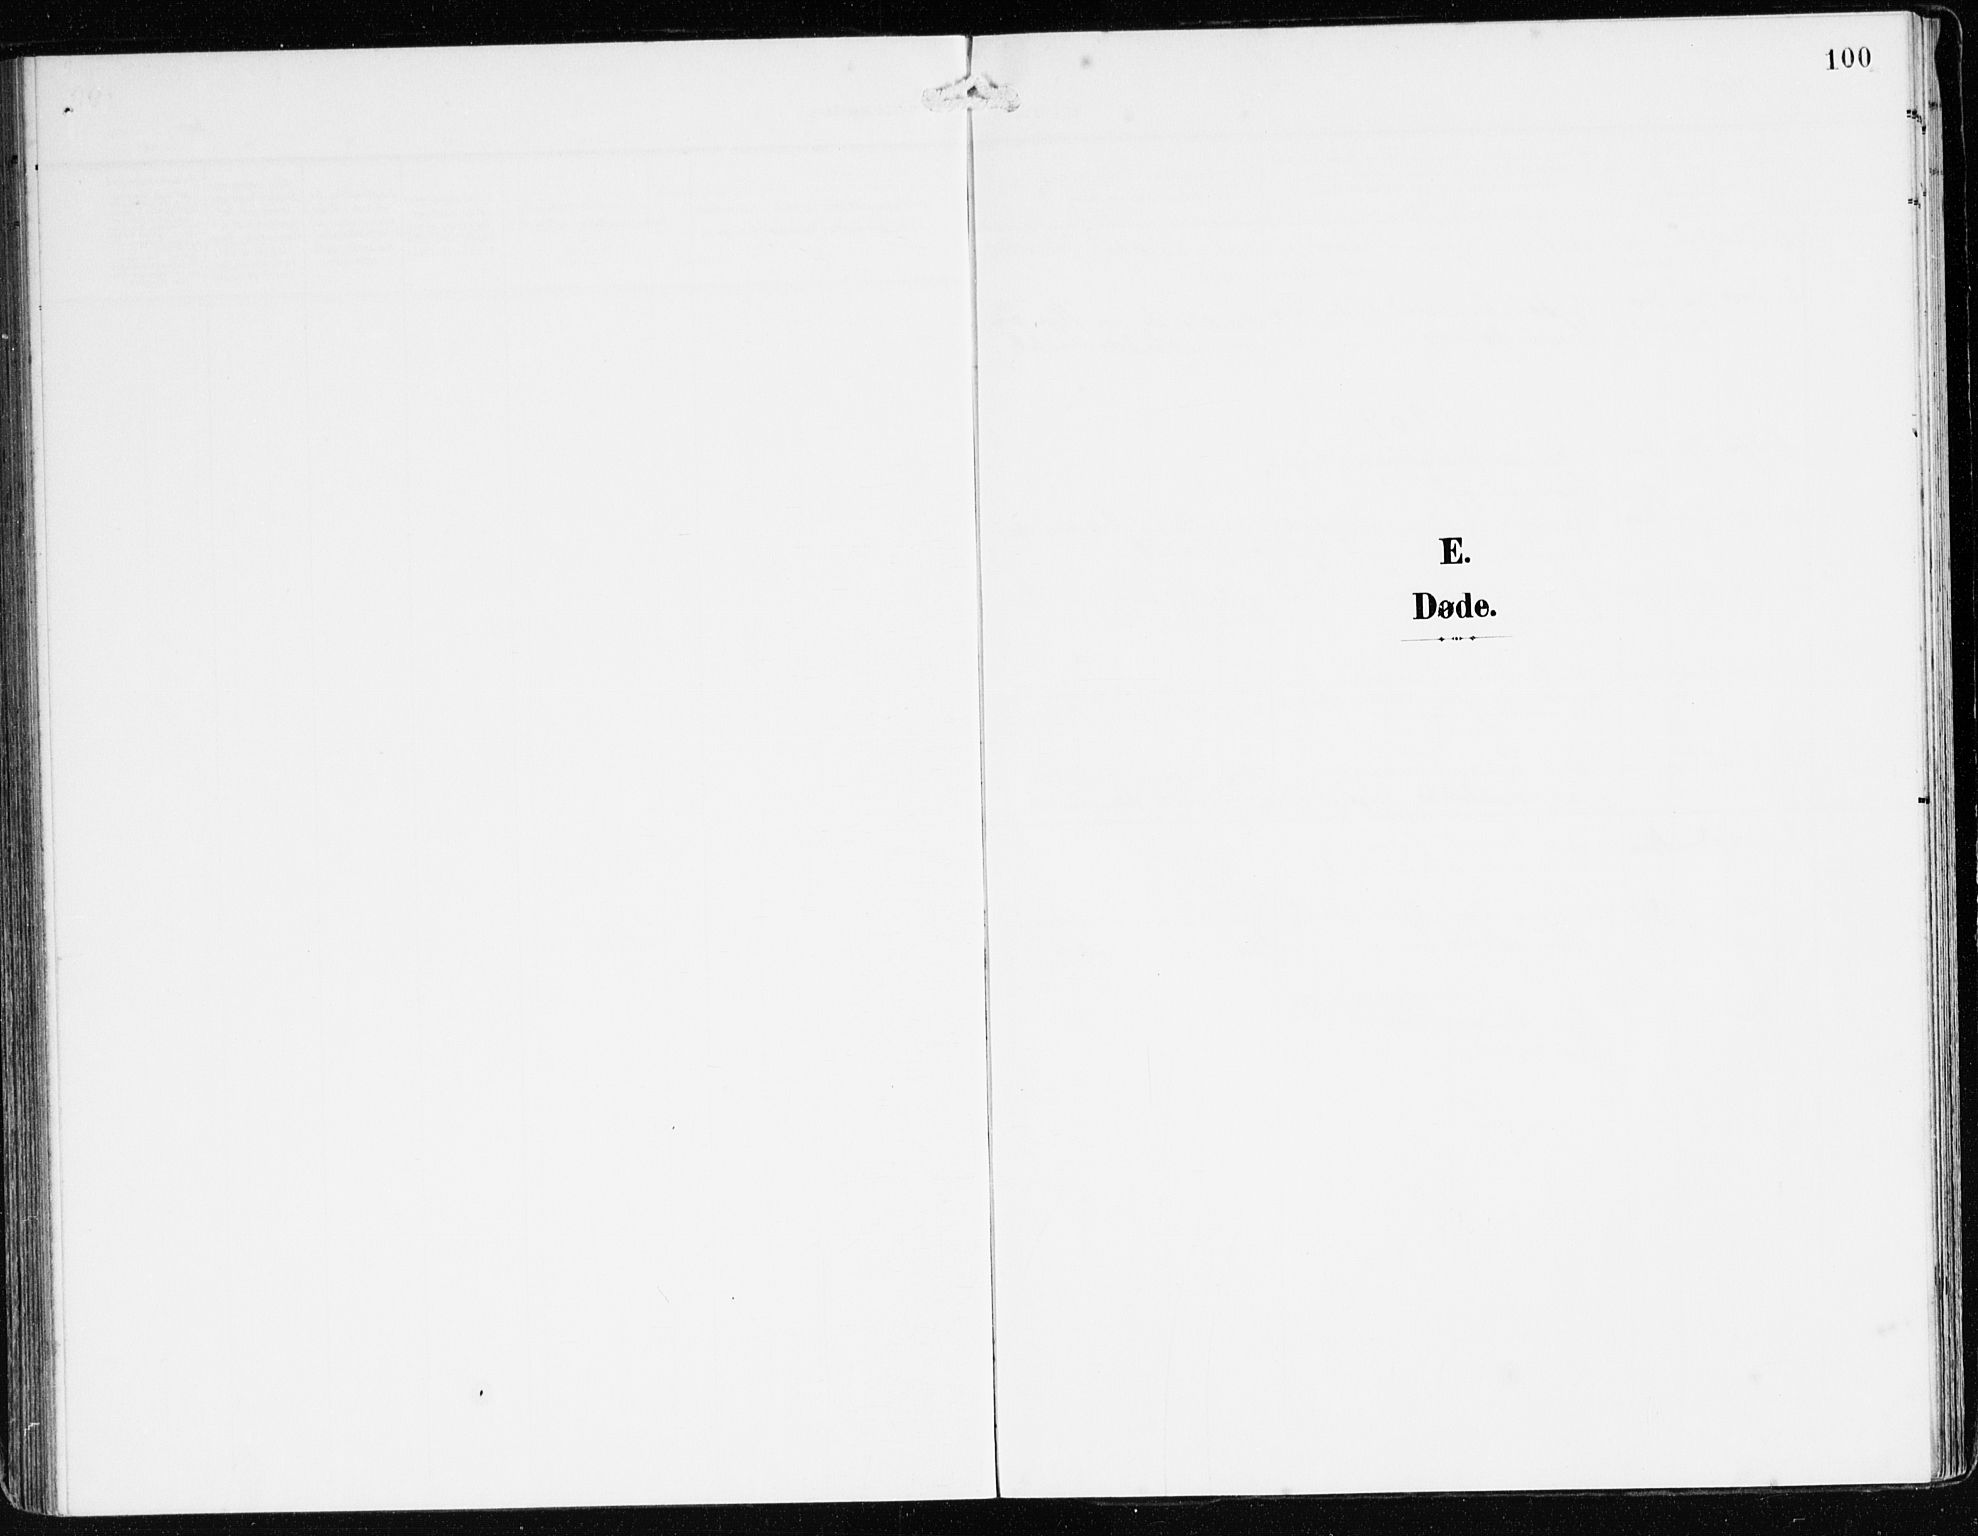 SAB, Bremanger Sokneprestembete, H/Haa: Ministerialbok nr. B 3, 1908-1925, s. 100